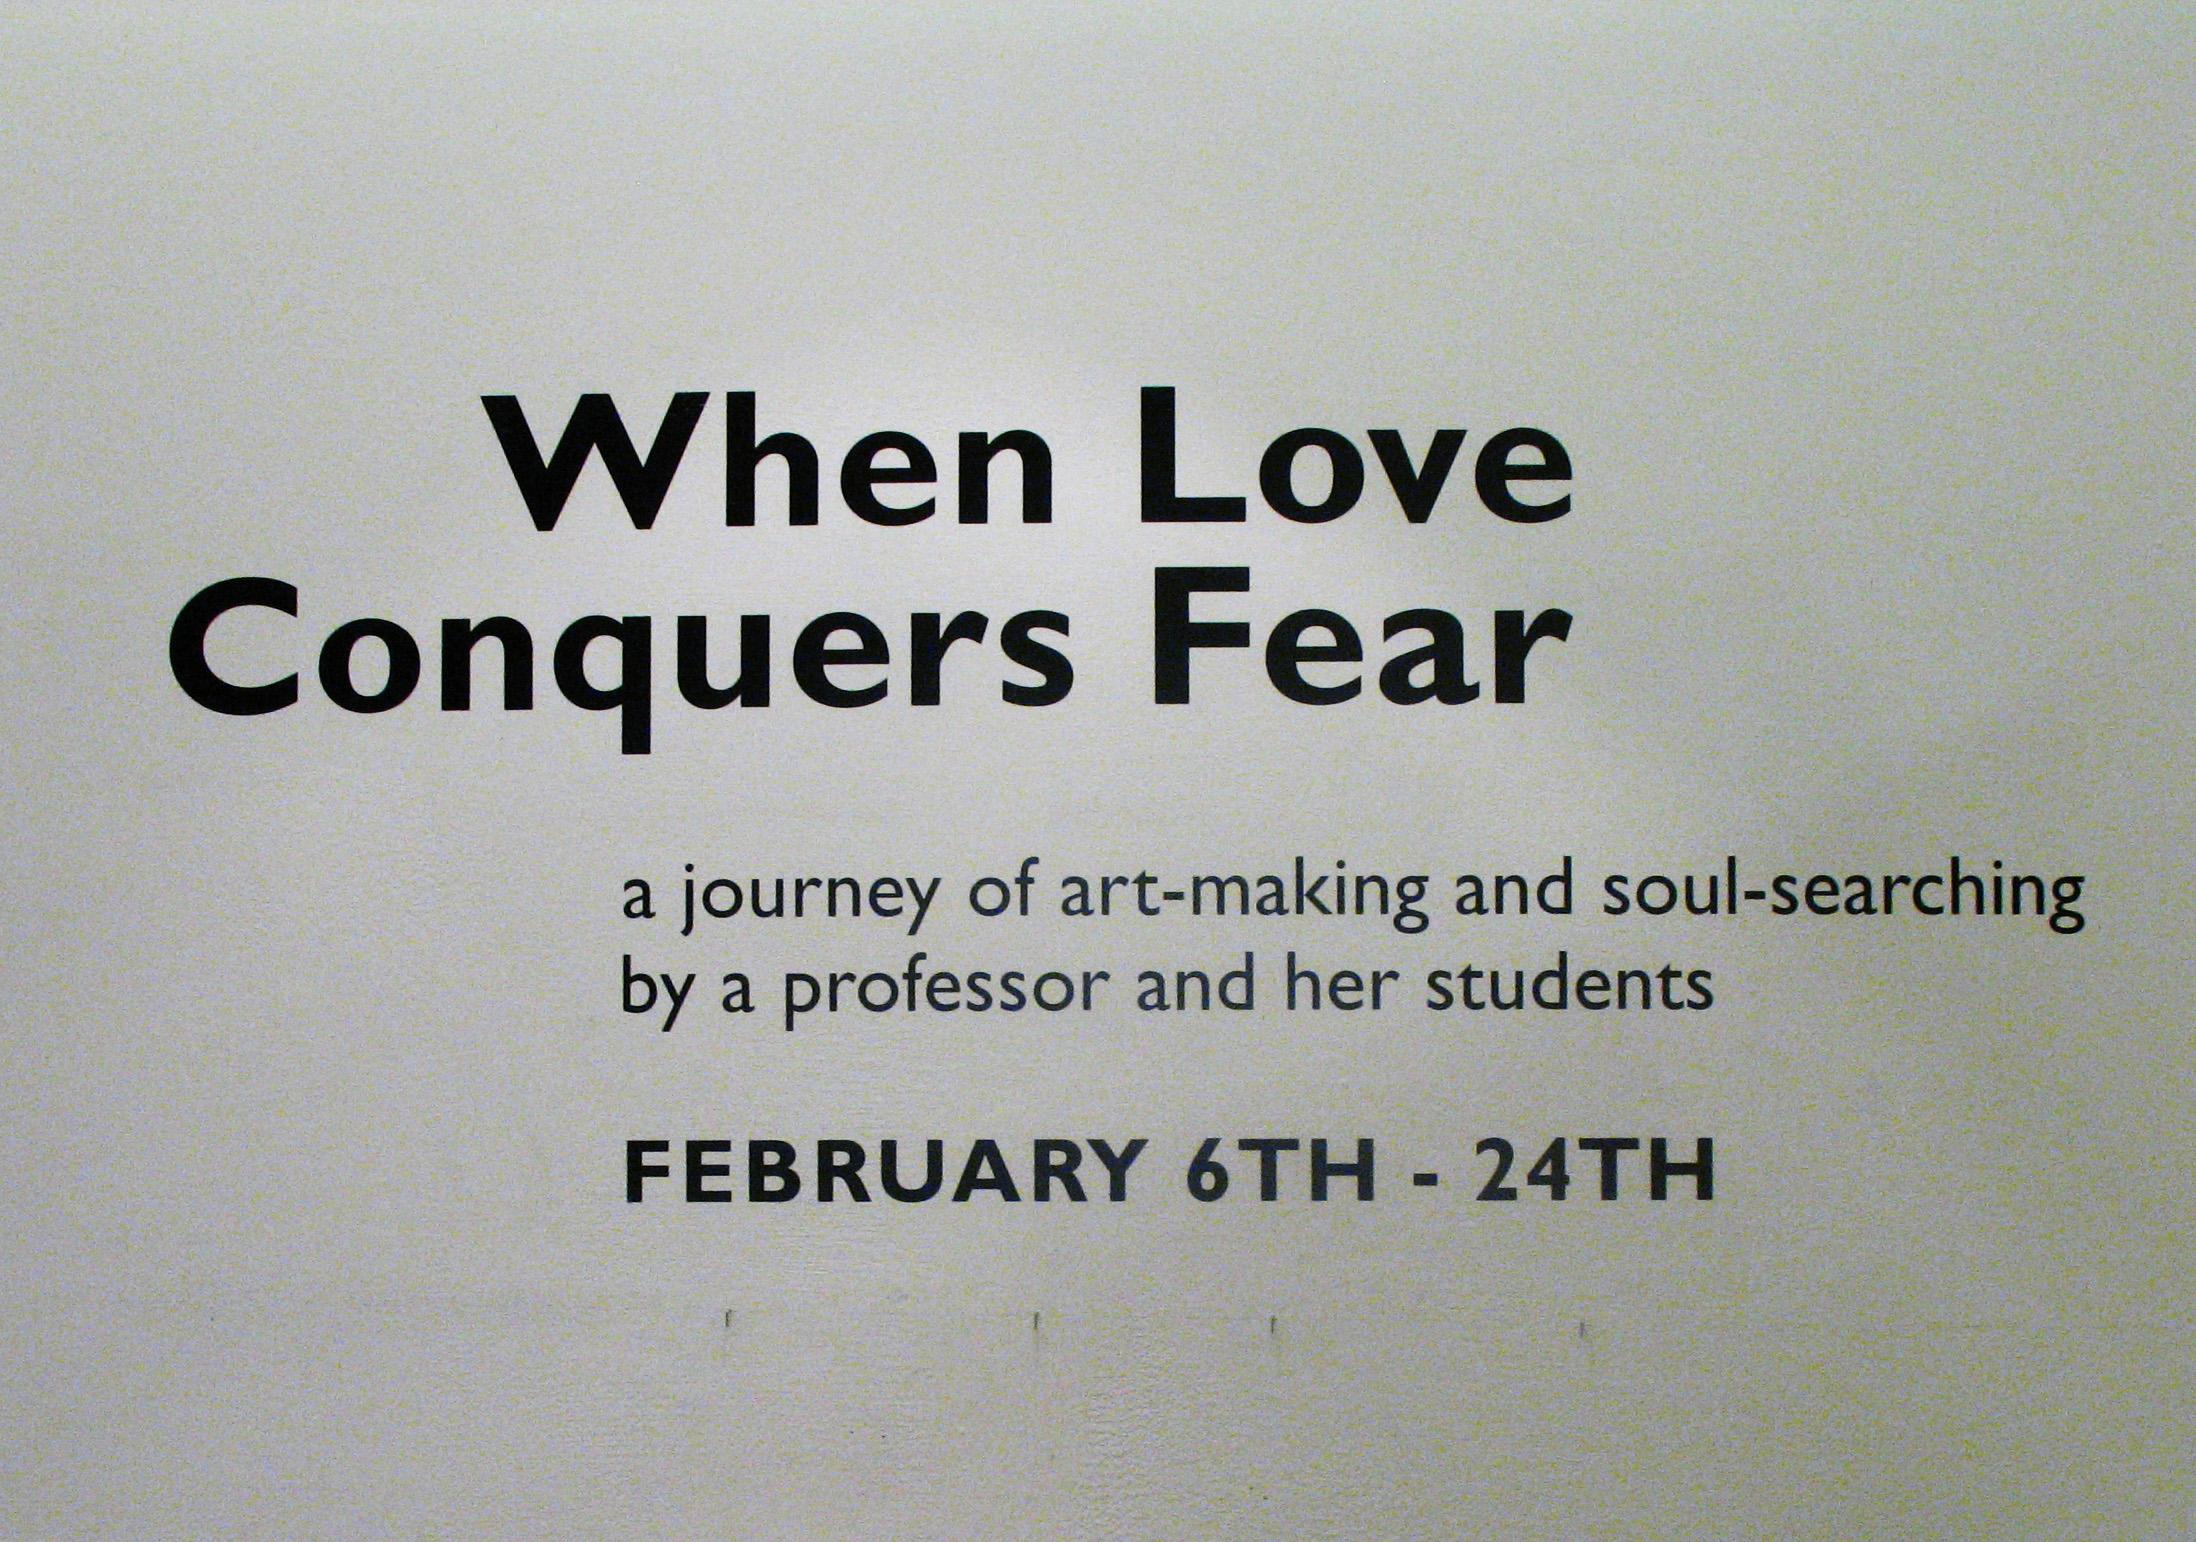 when love conquers fear